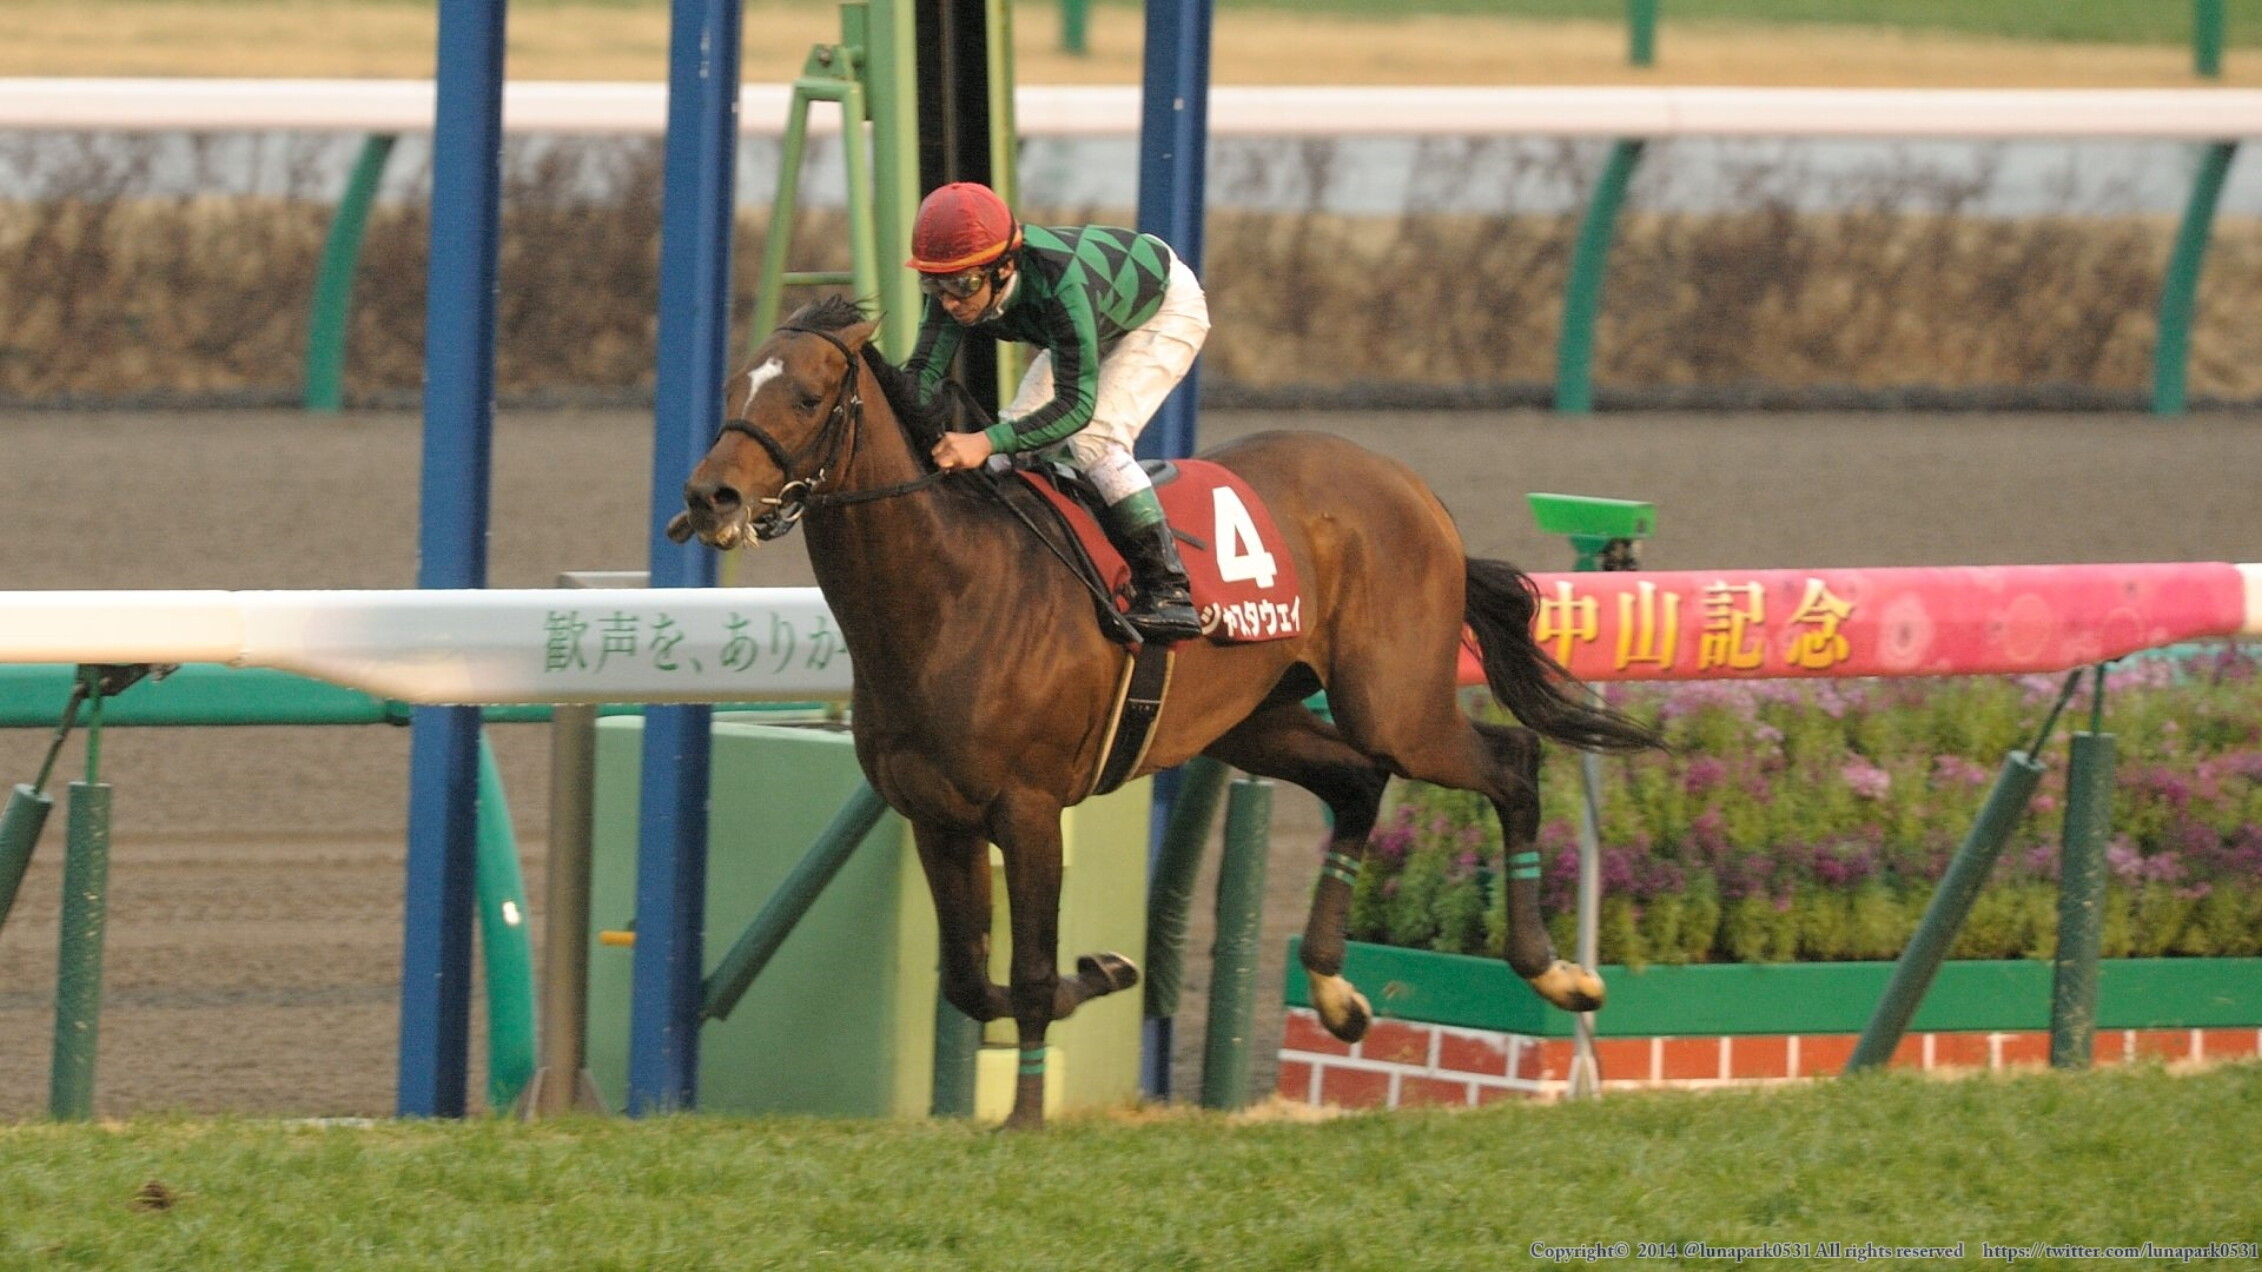 Yokoyama Norihiro with Just a Way